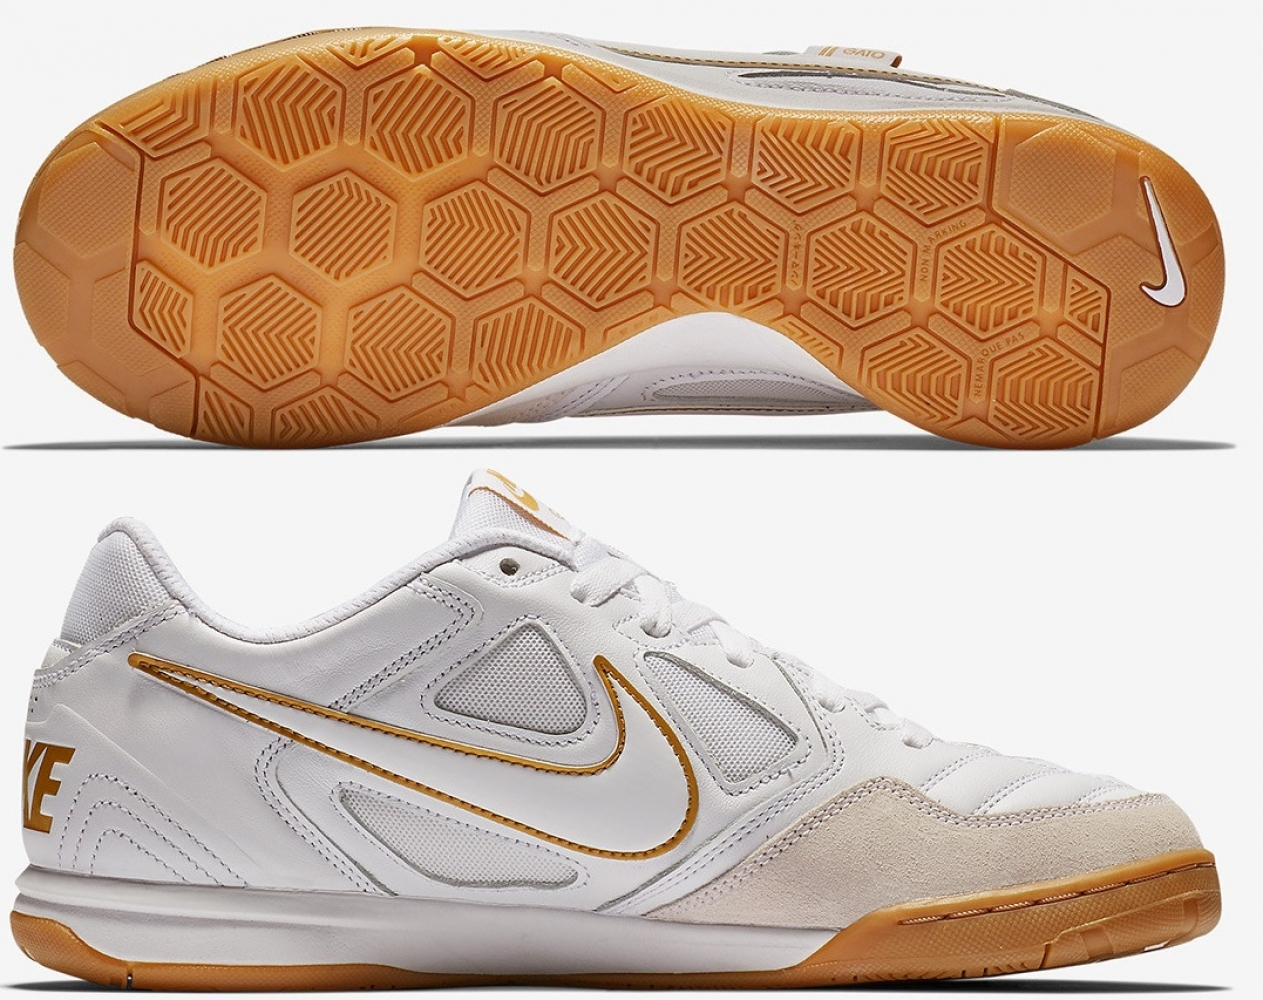 2316e5b1e152 Футзалки Nike SB Gato AT4607-100 купить в интернет-магазине Sport ...